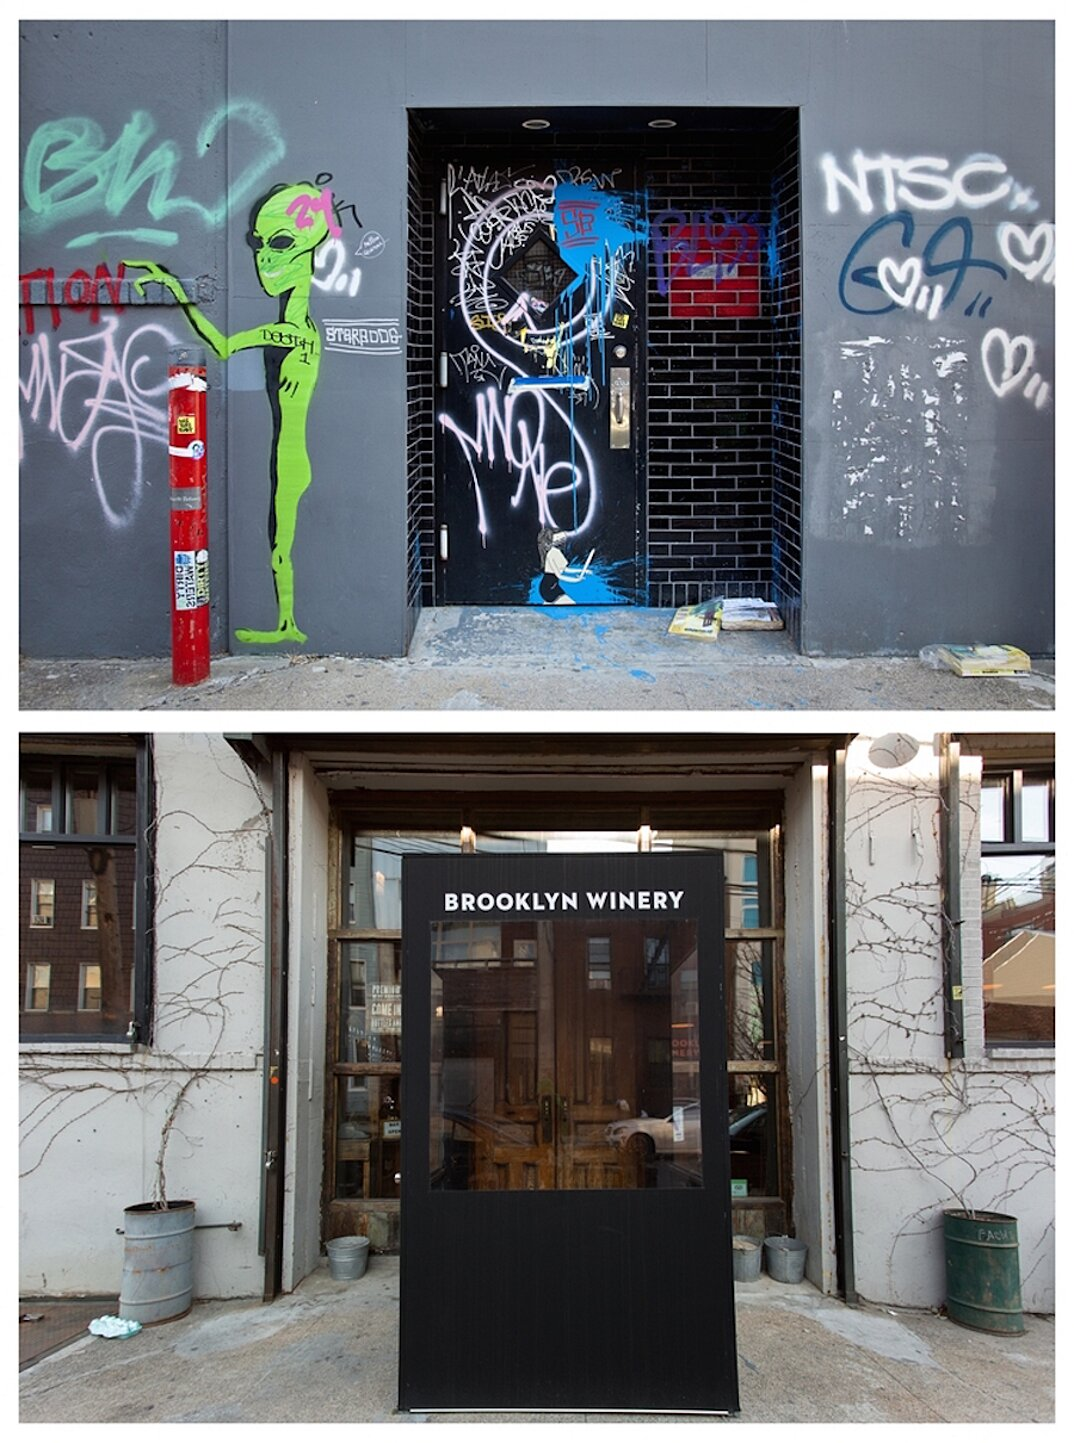 brooklyn-changing-ieri-oggi-imborghesimento-fotografia-kristy-chatelain-07